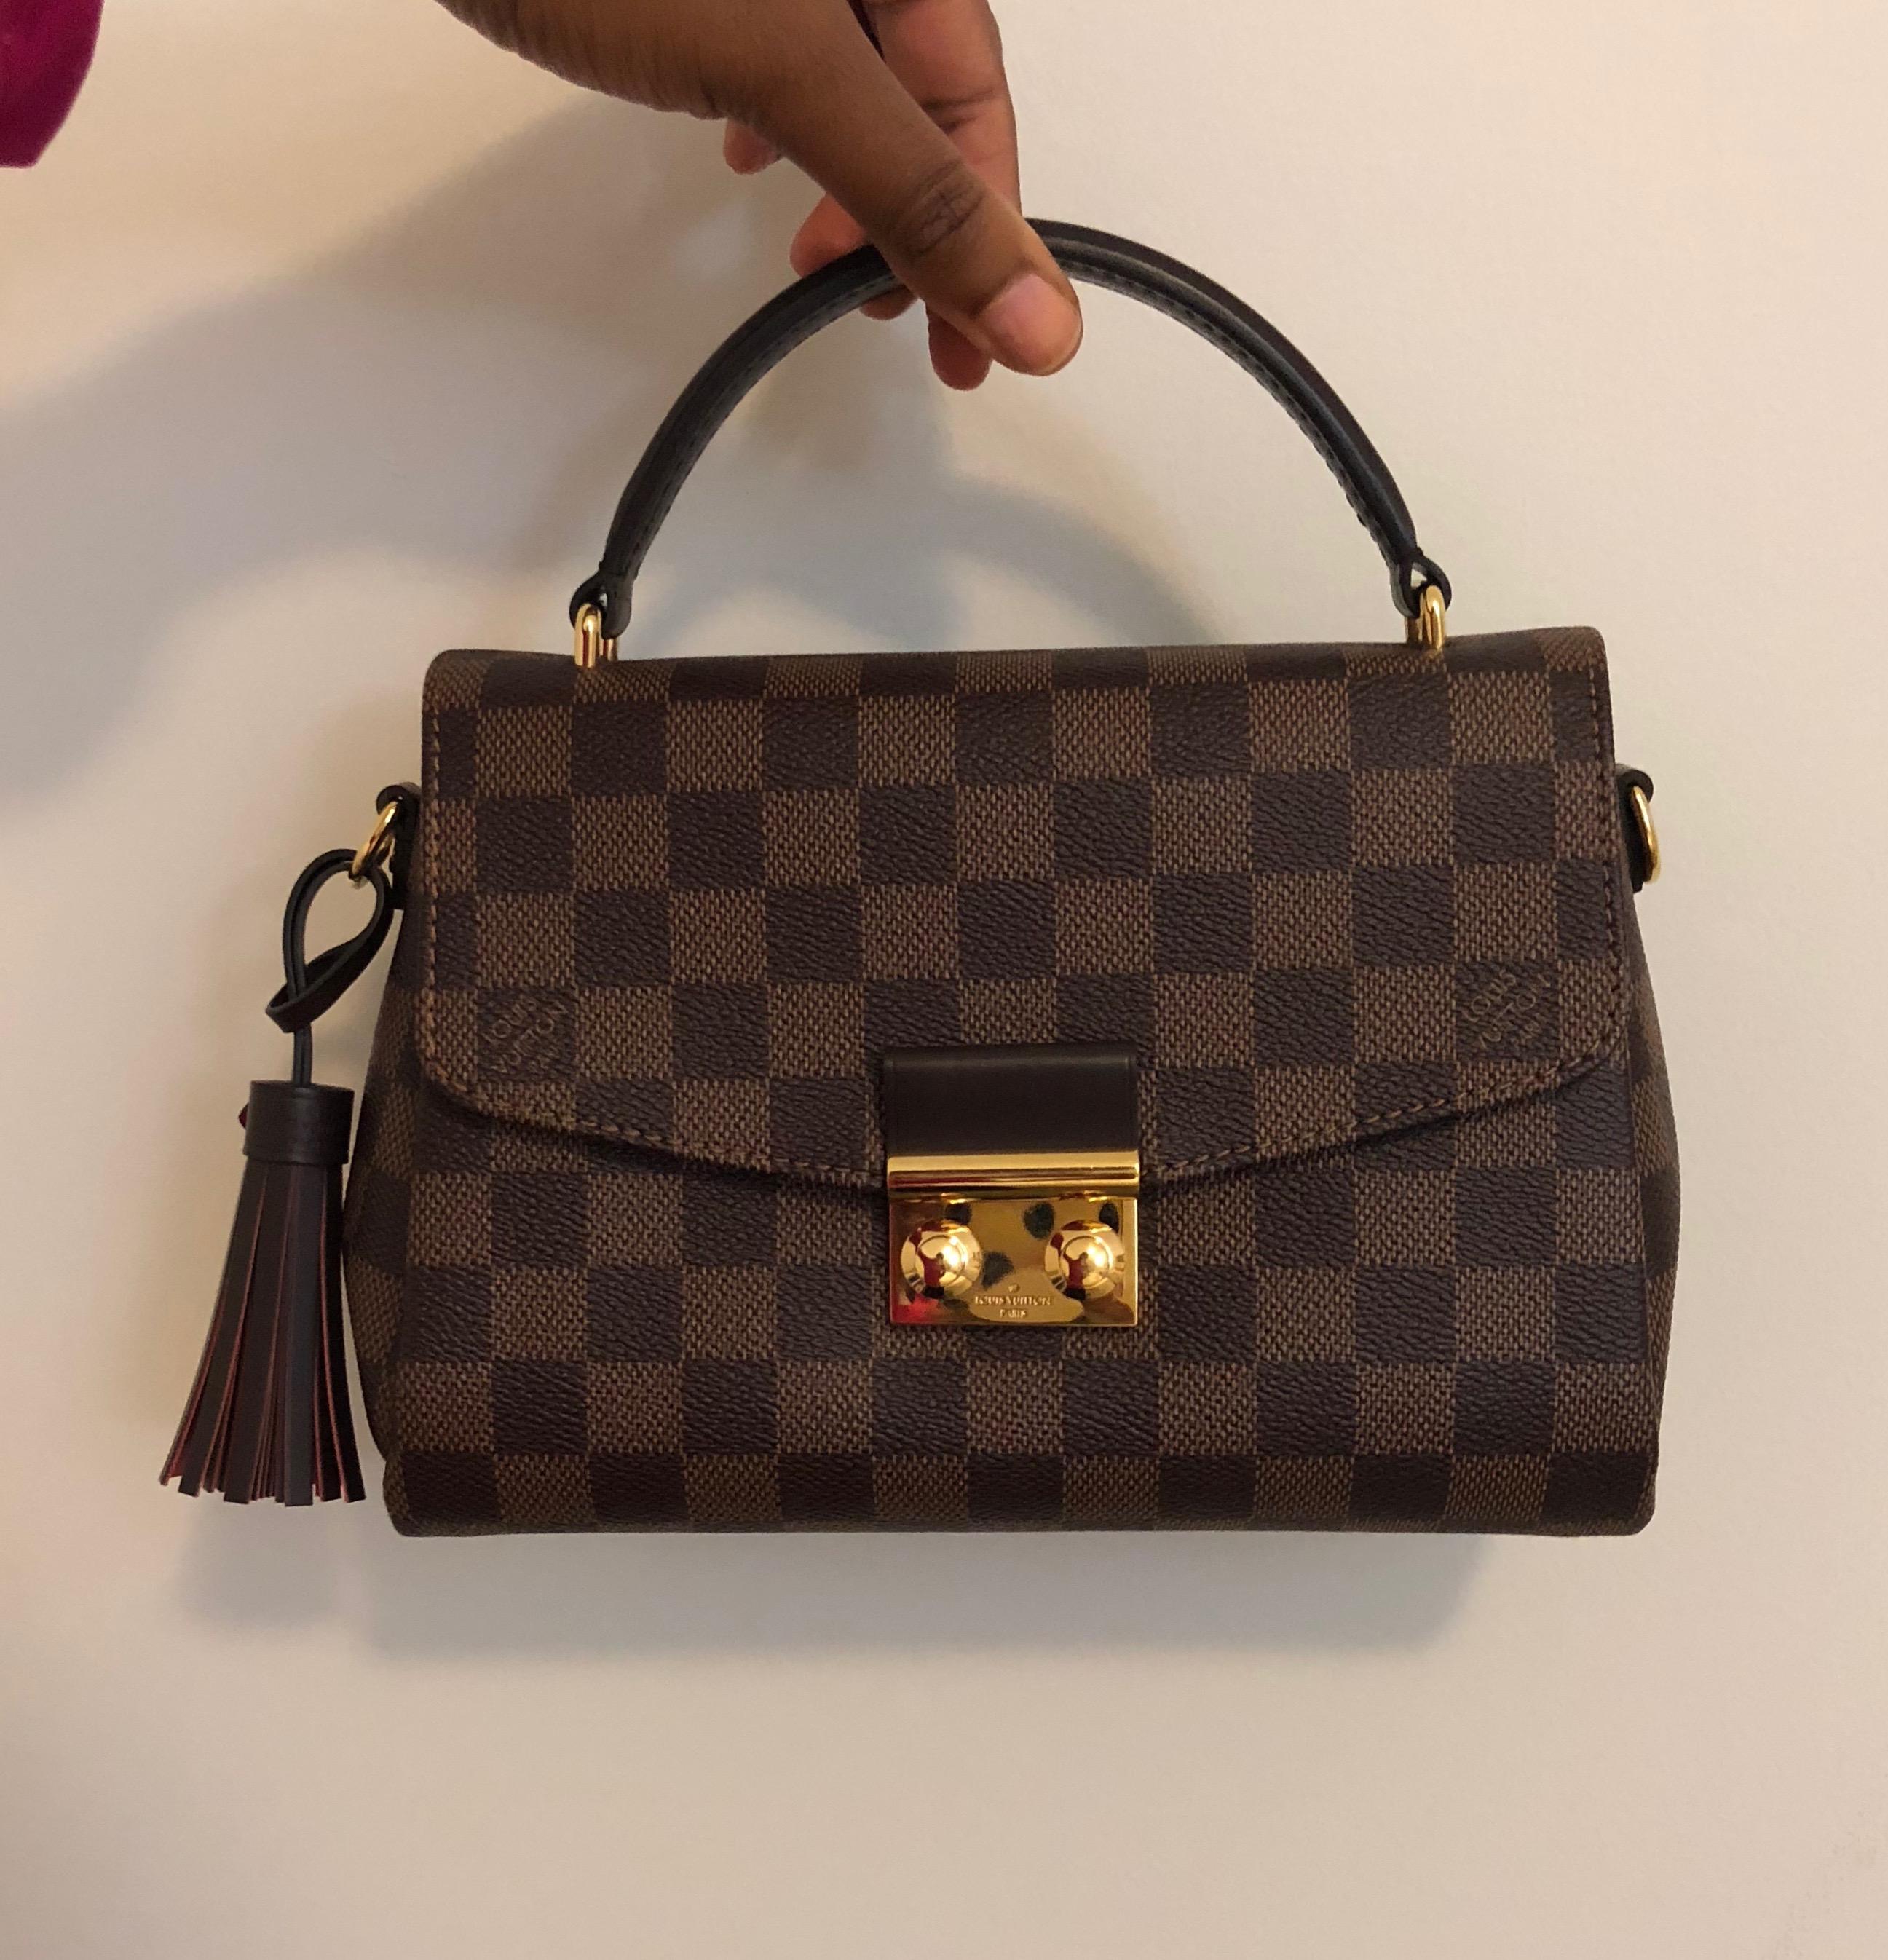 291c845adc070 Louis Vuitton Damier Ebene Croisette – DesignerShare